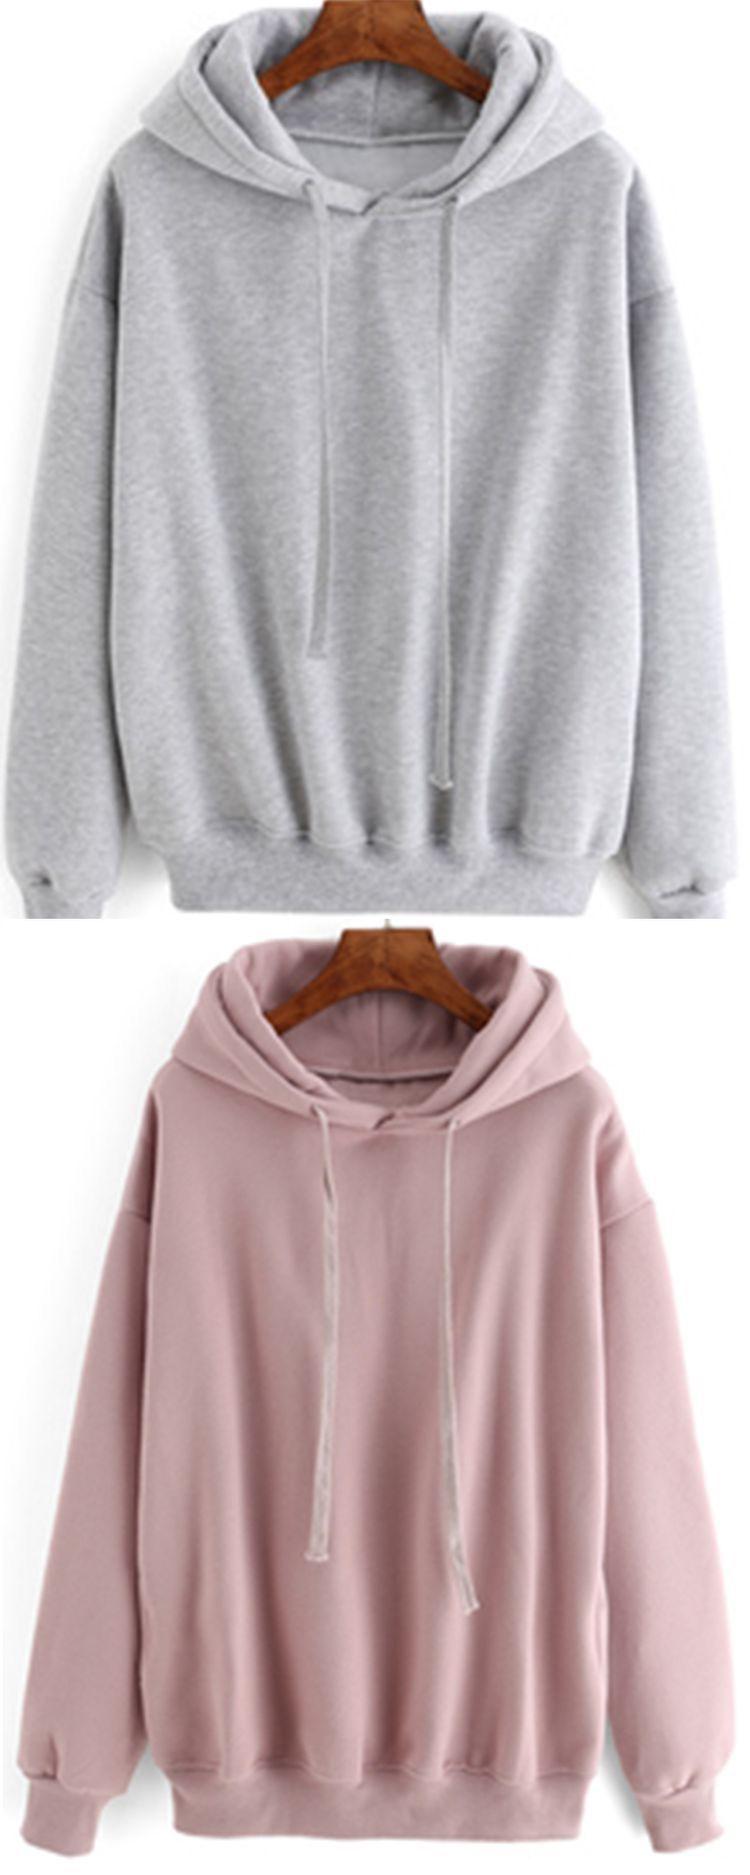 Pin By Kaleo Maclay On Ropa Y Calzado Sweatshirts Clothes Layering Outfits [ 1875 x 750 Pixel ]